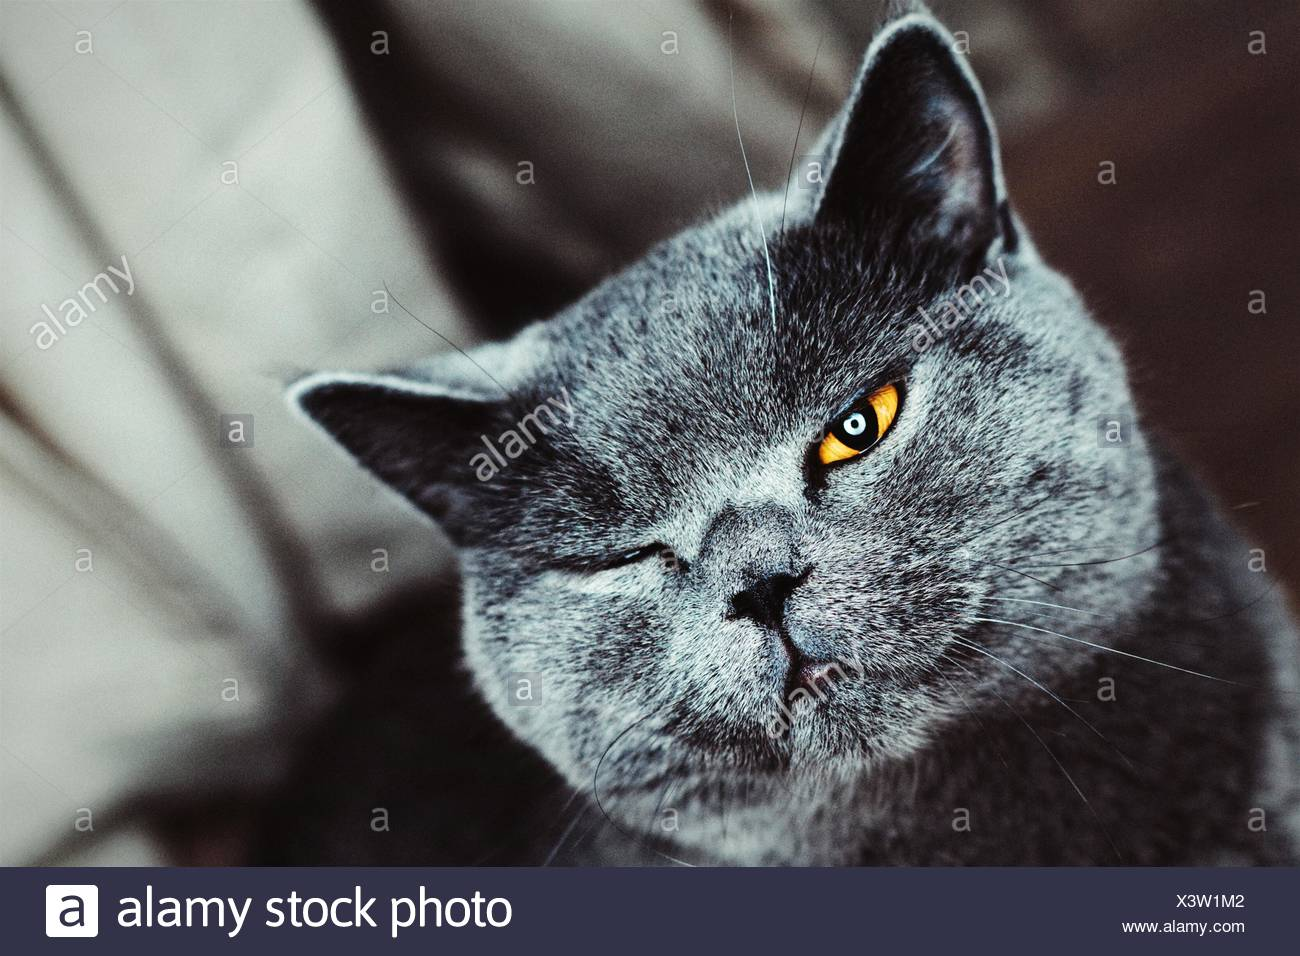 Retrato en primer plano de Chartreux Gato guiño Imagen De Stock